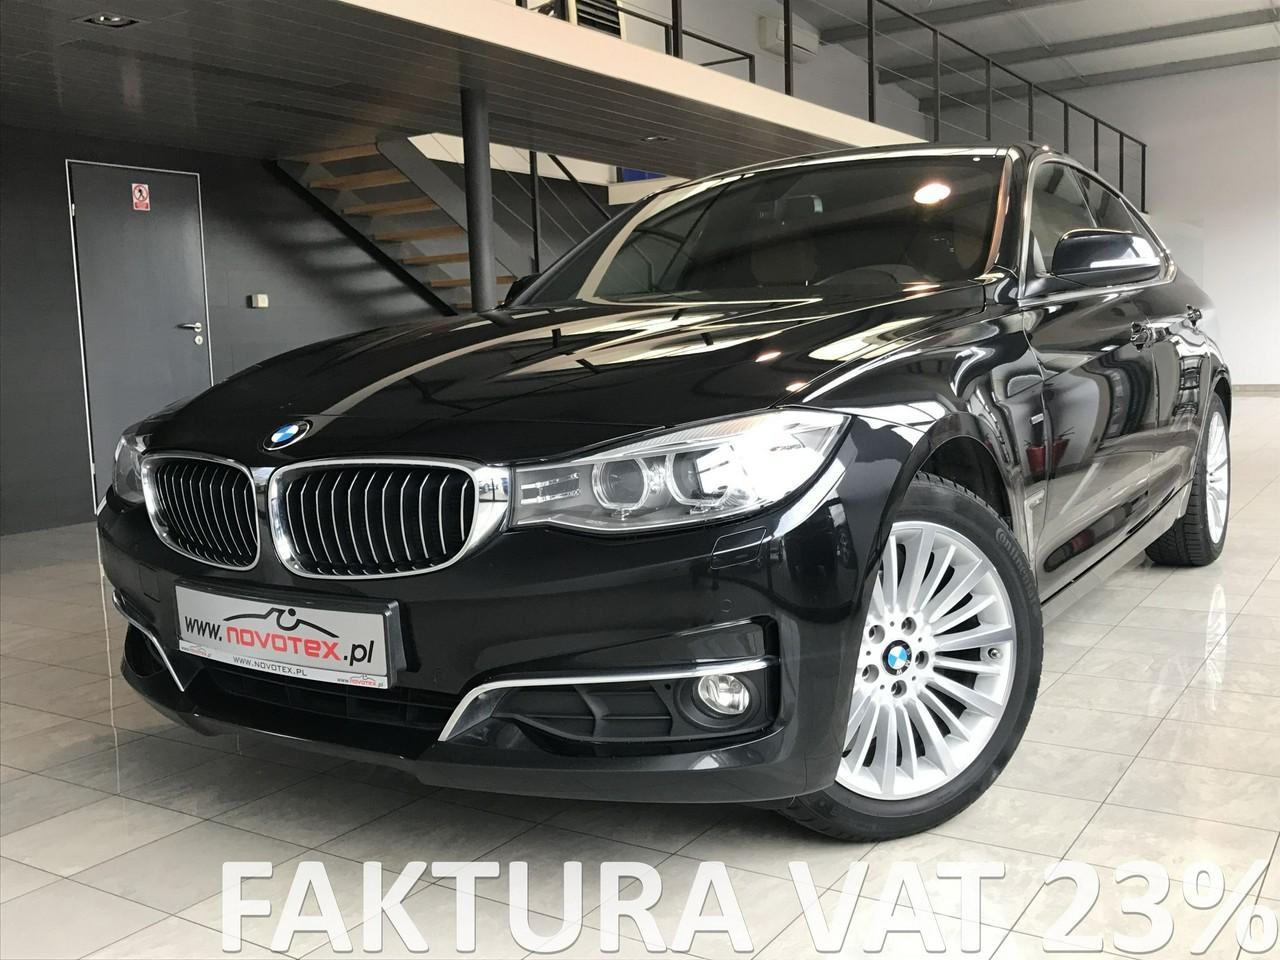 BMW 318 2.0D*Gran Turismo*GT*Luxury*kamera*serwis w ASO*Gwarancja VIP Gwarant